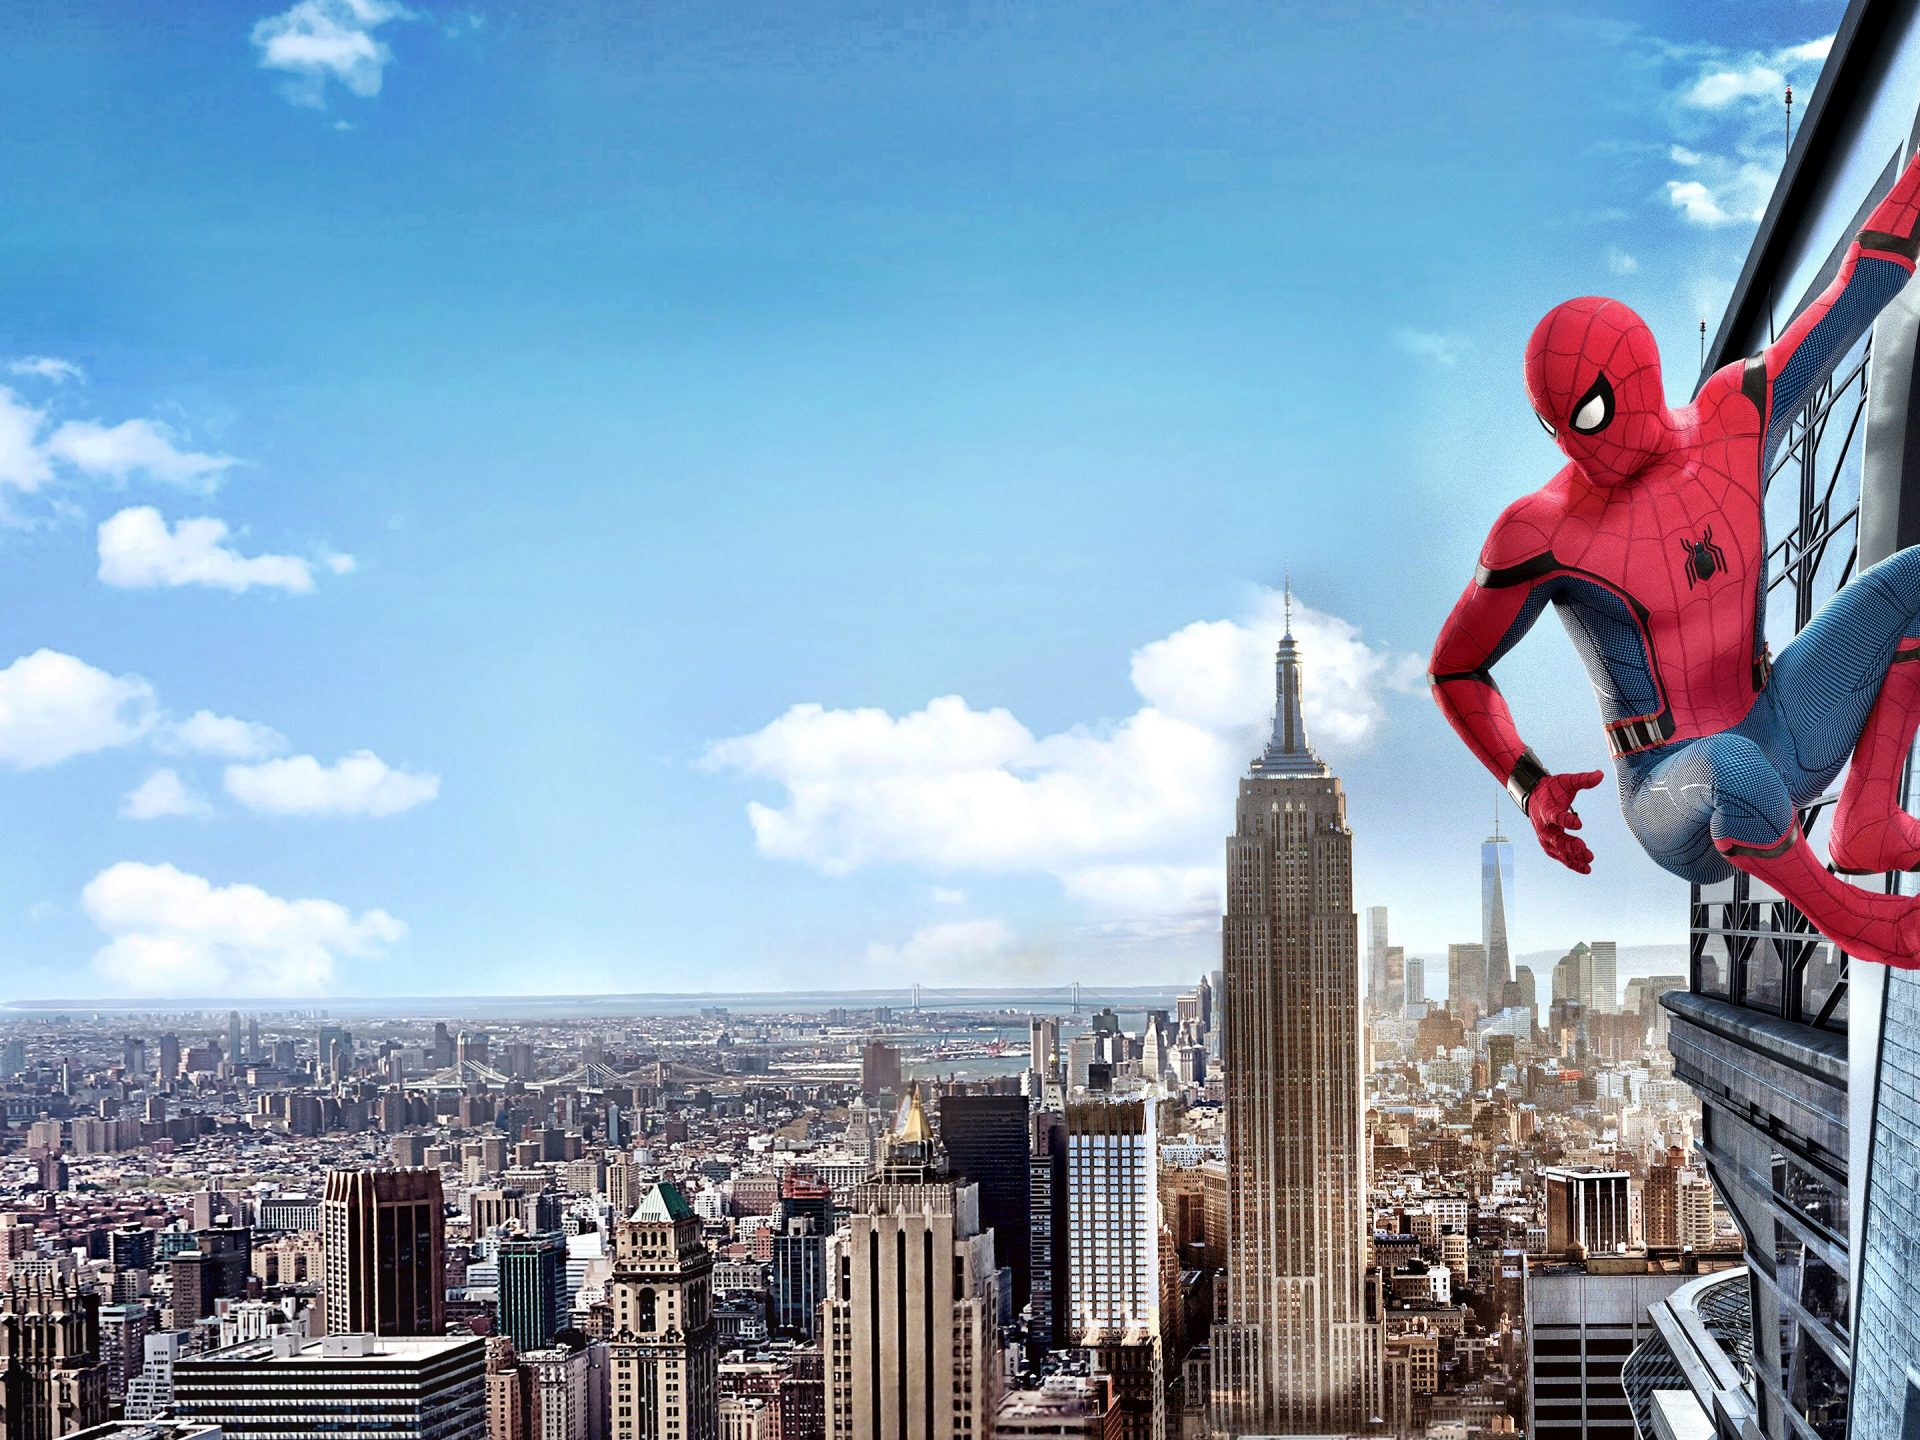 Spiderman homecoming full movie hd subtitle - 5 8